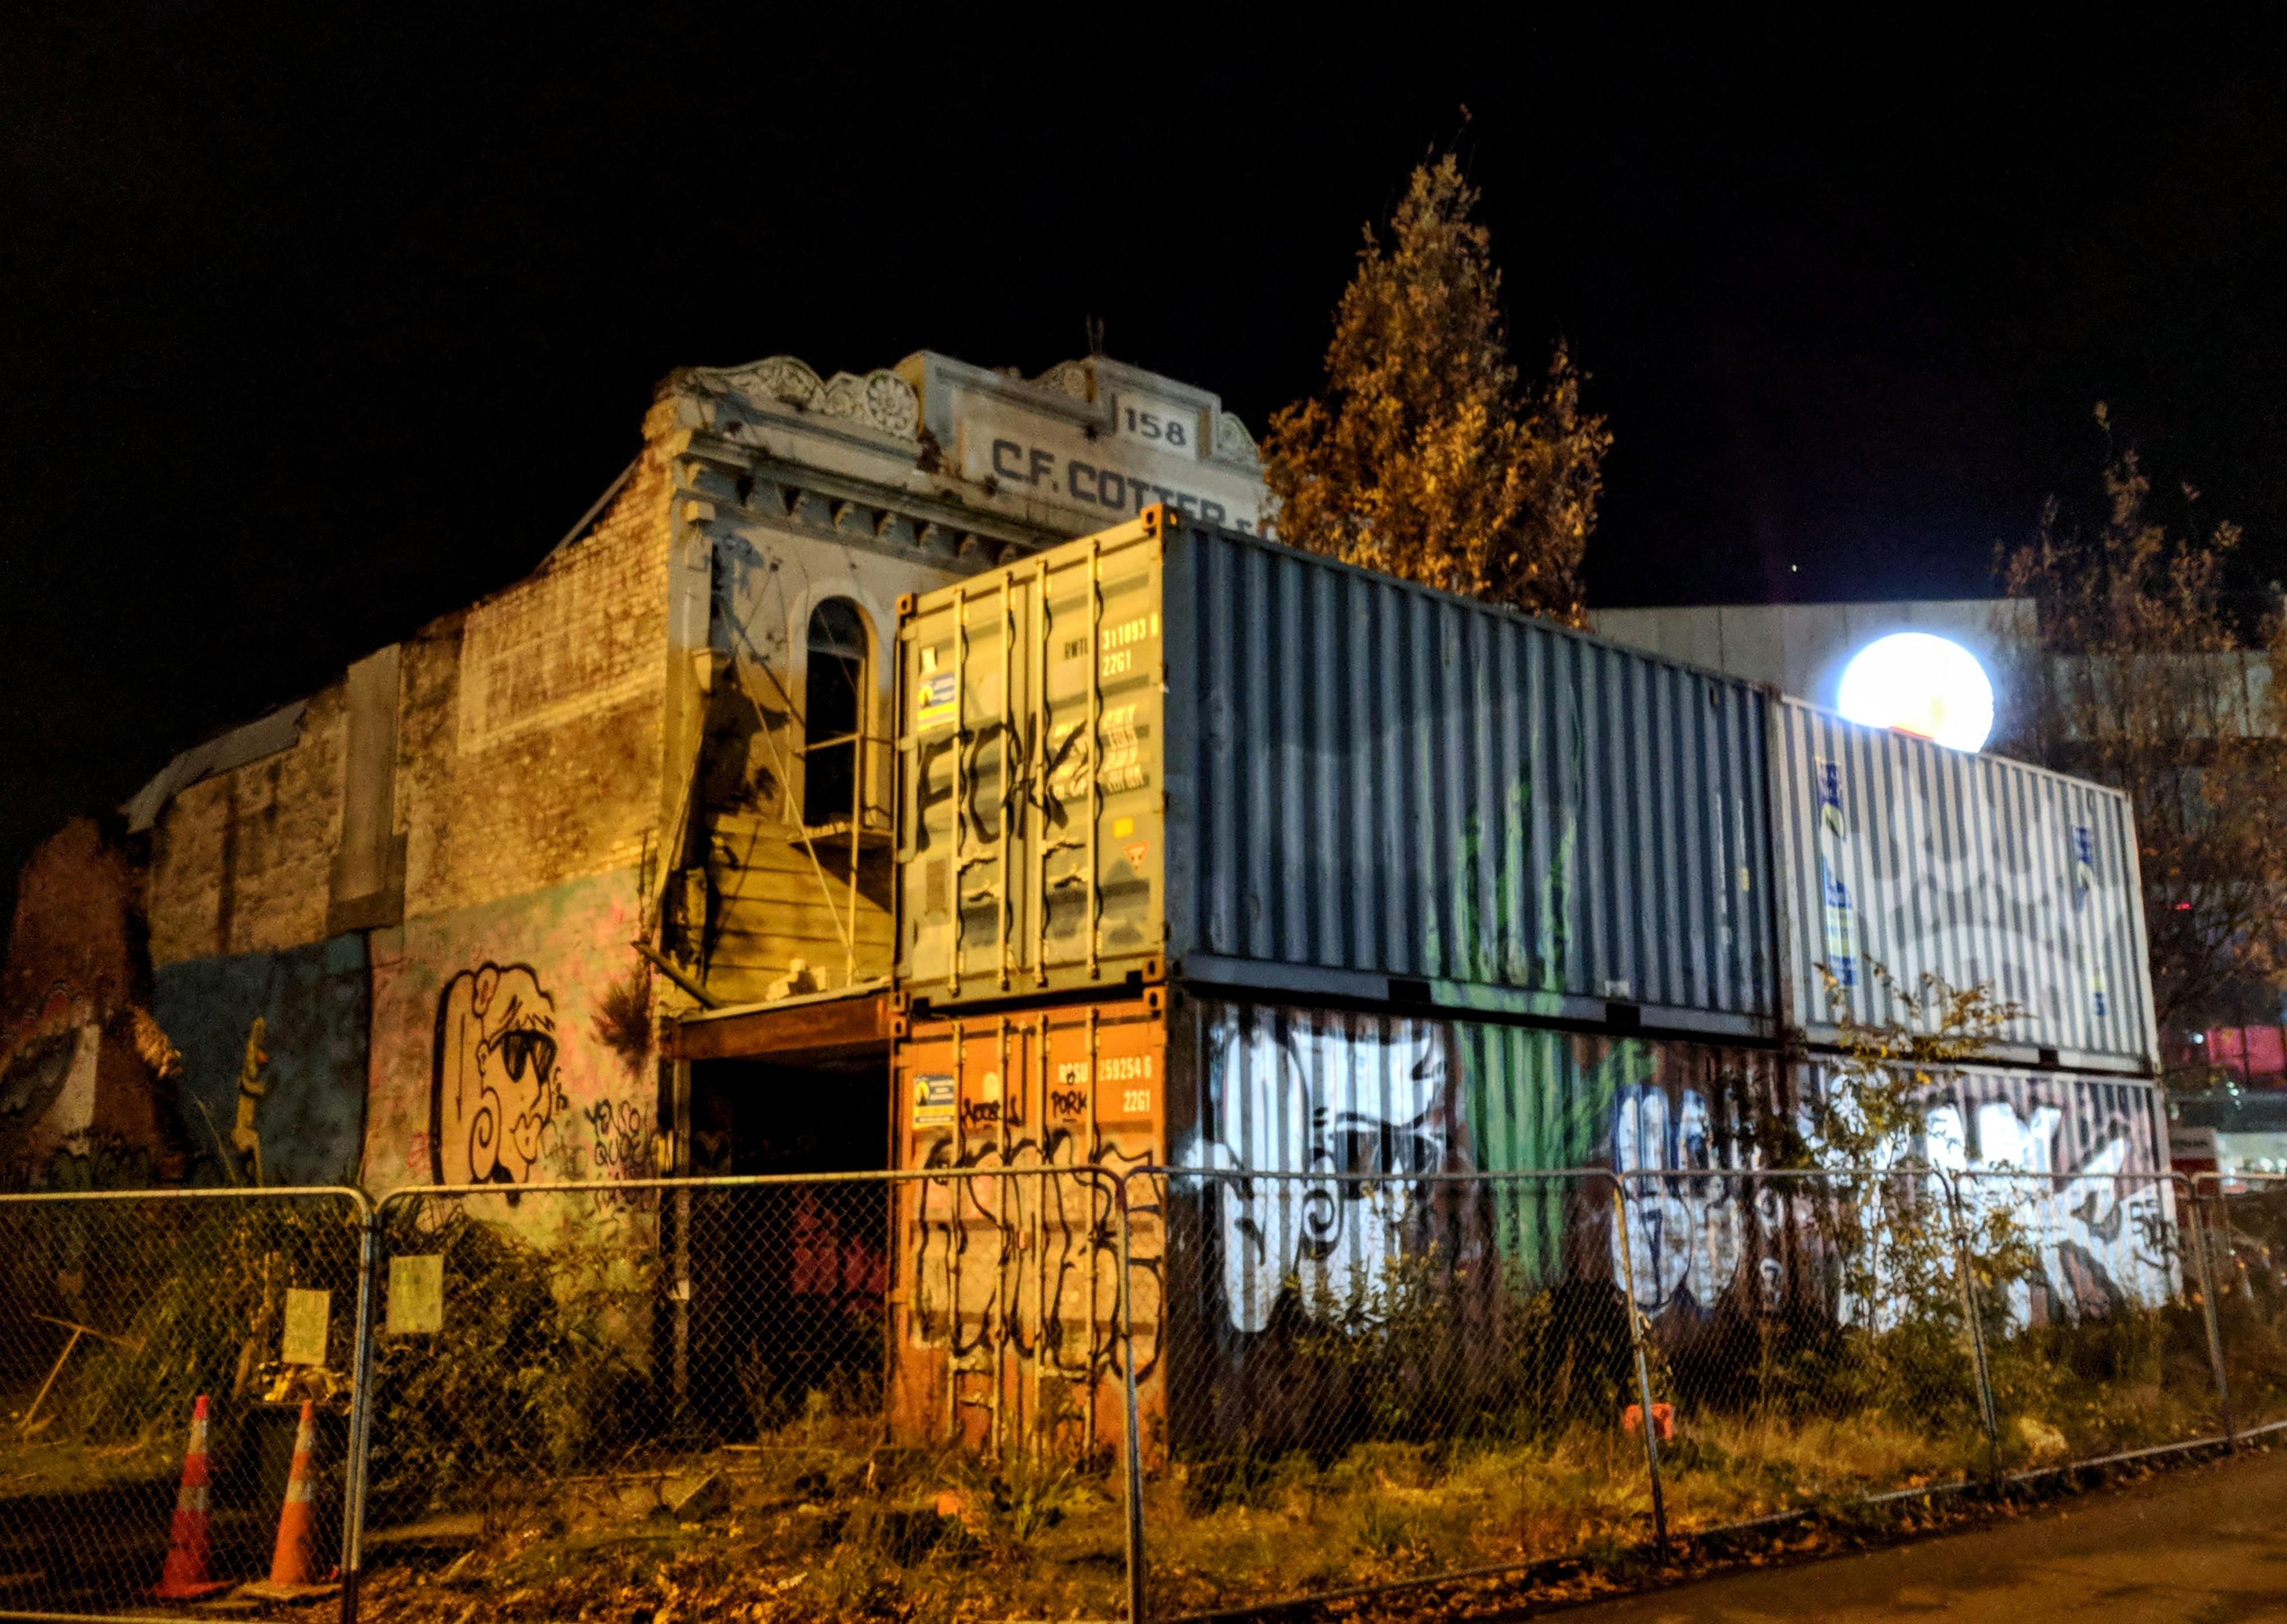 Damaged CF Cotter building, Christchurch (NZ)